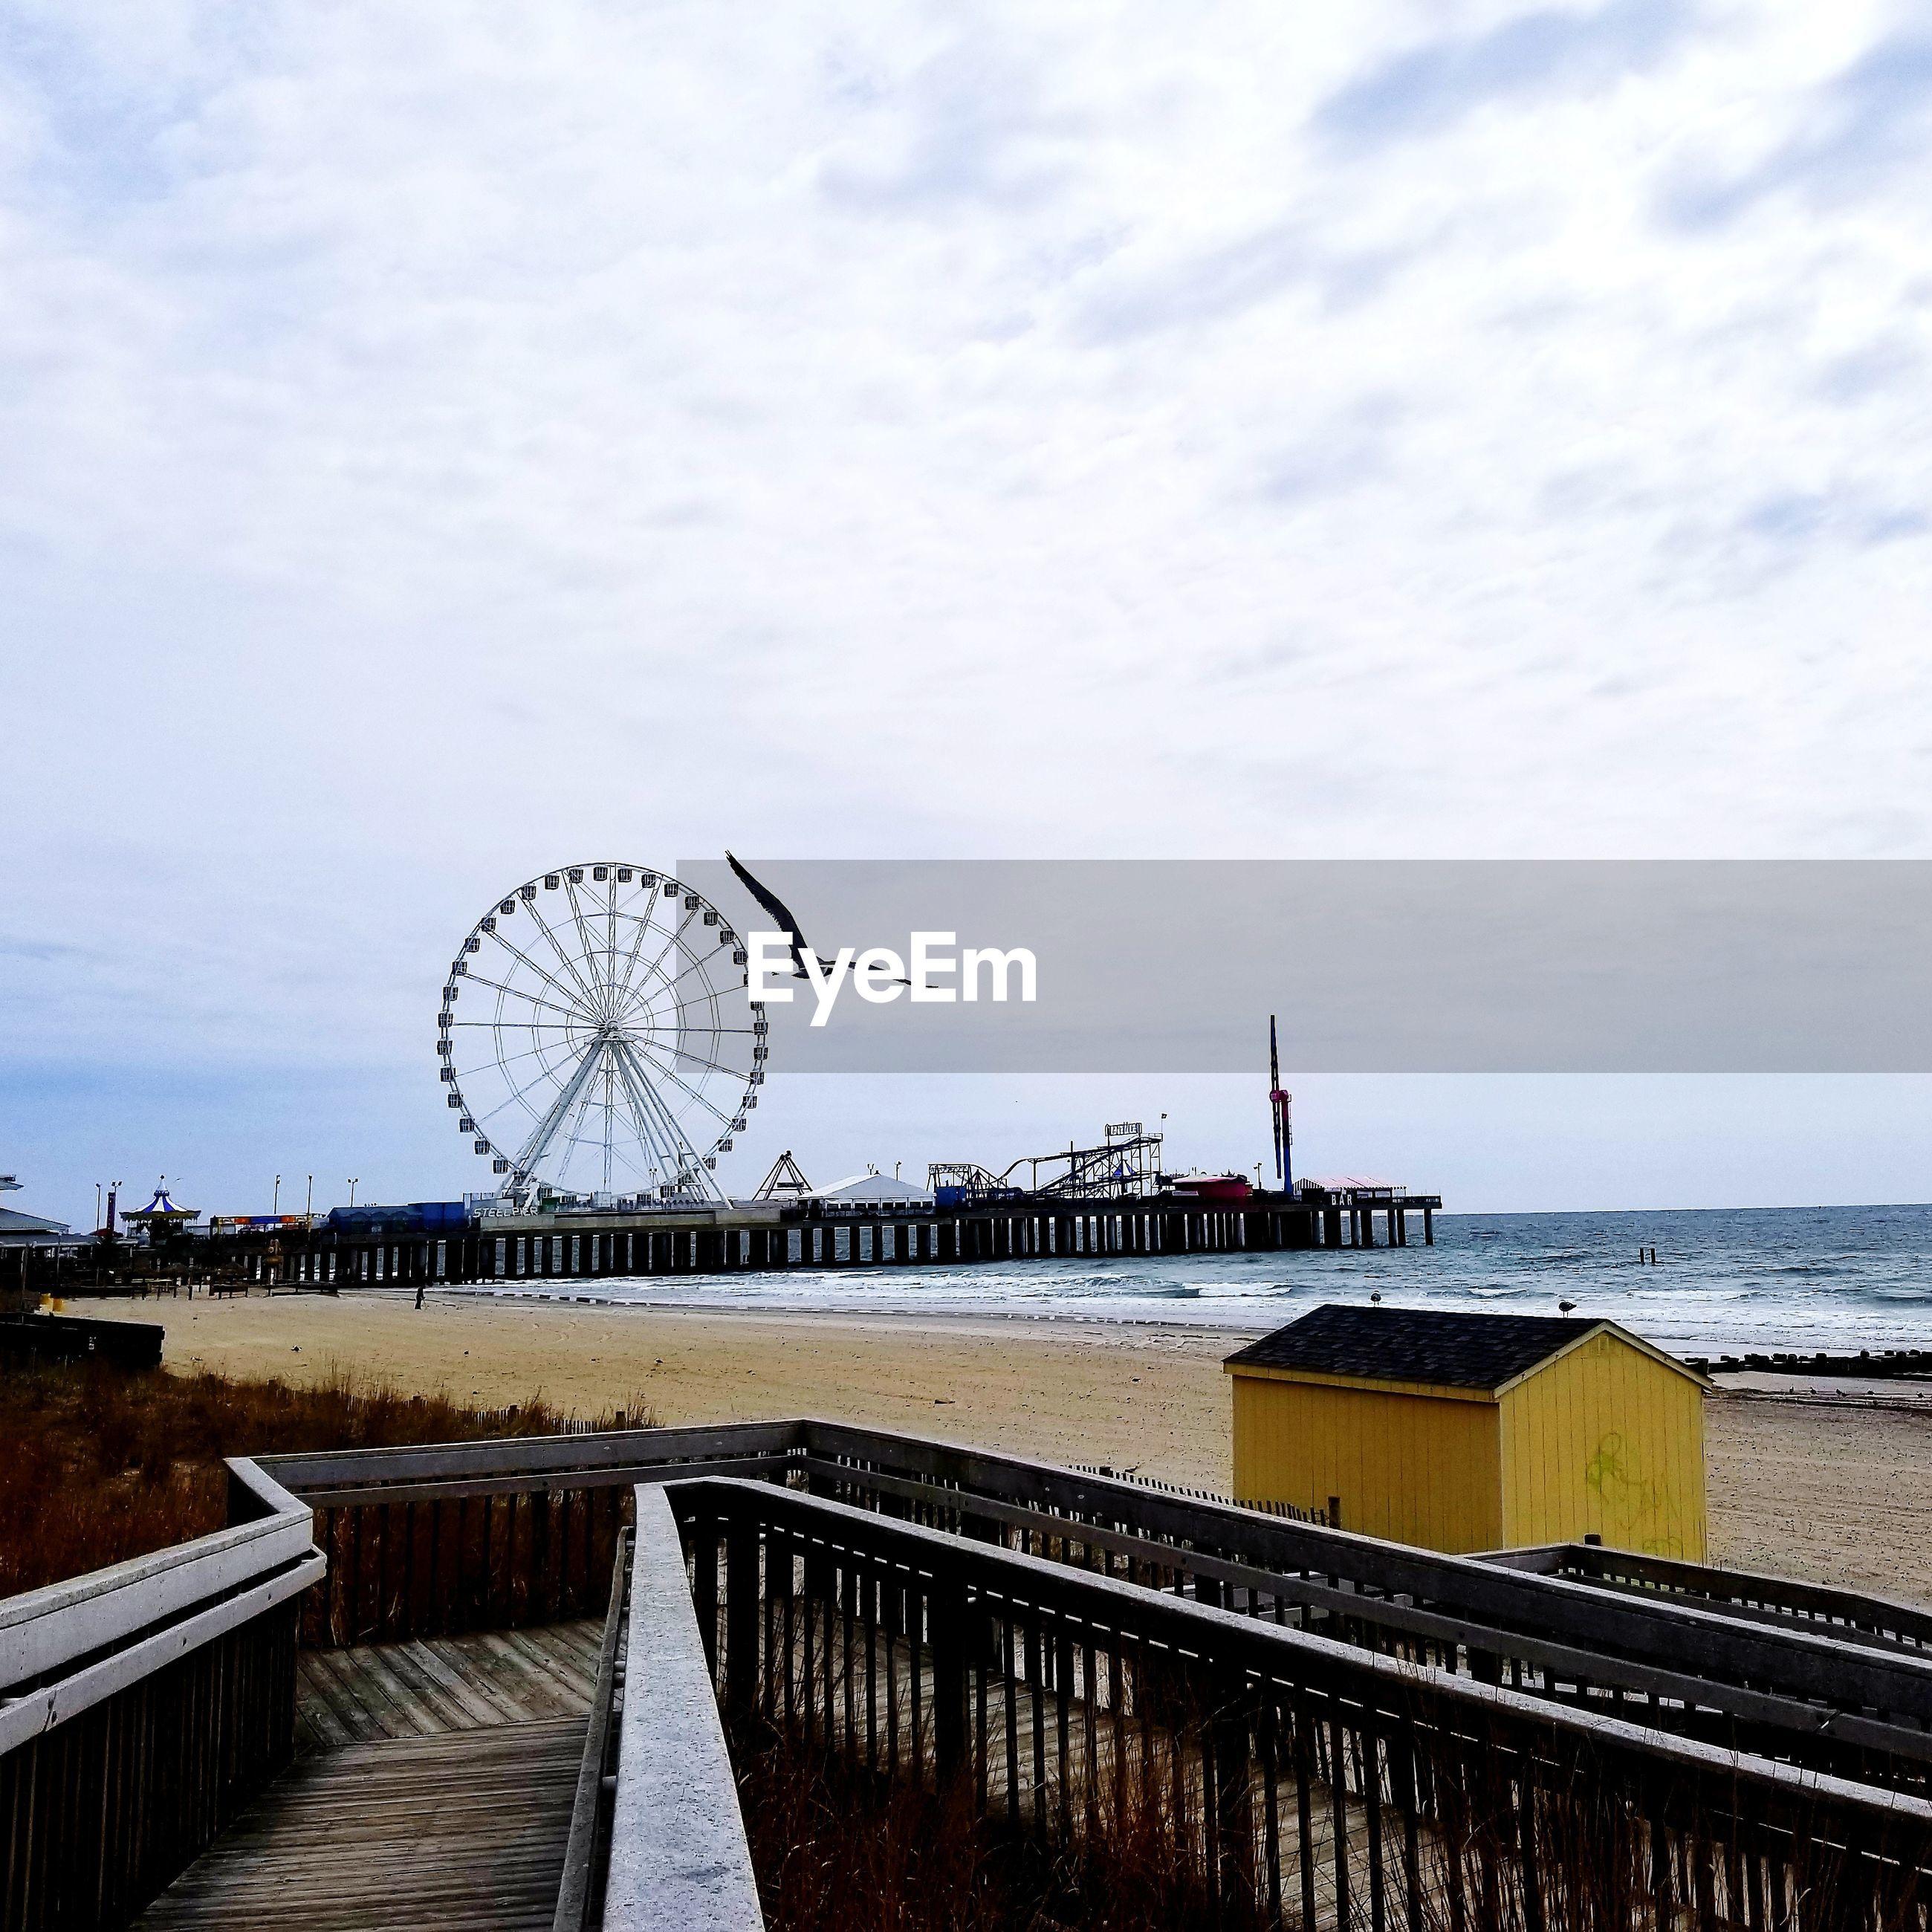 Ferris wheel by pier at sea against cloudy sky